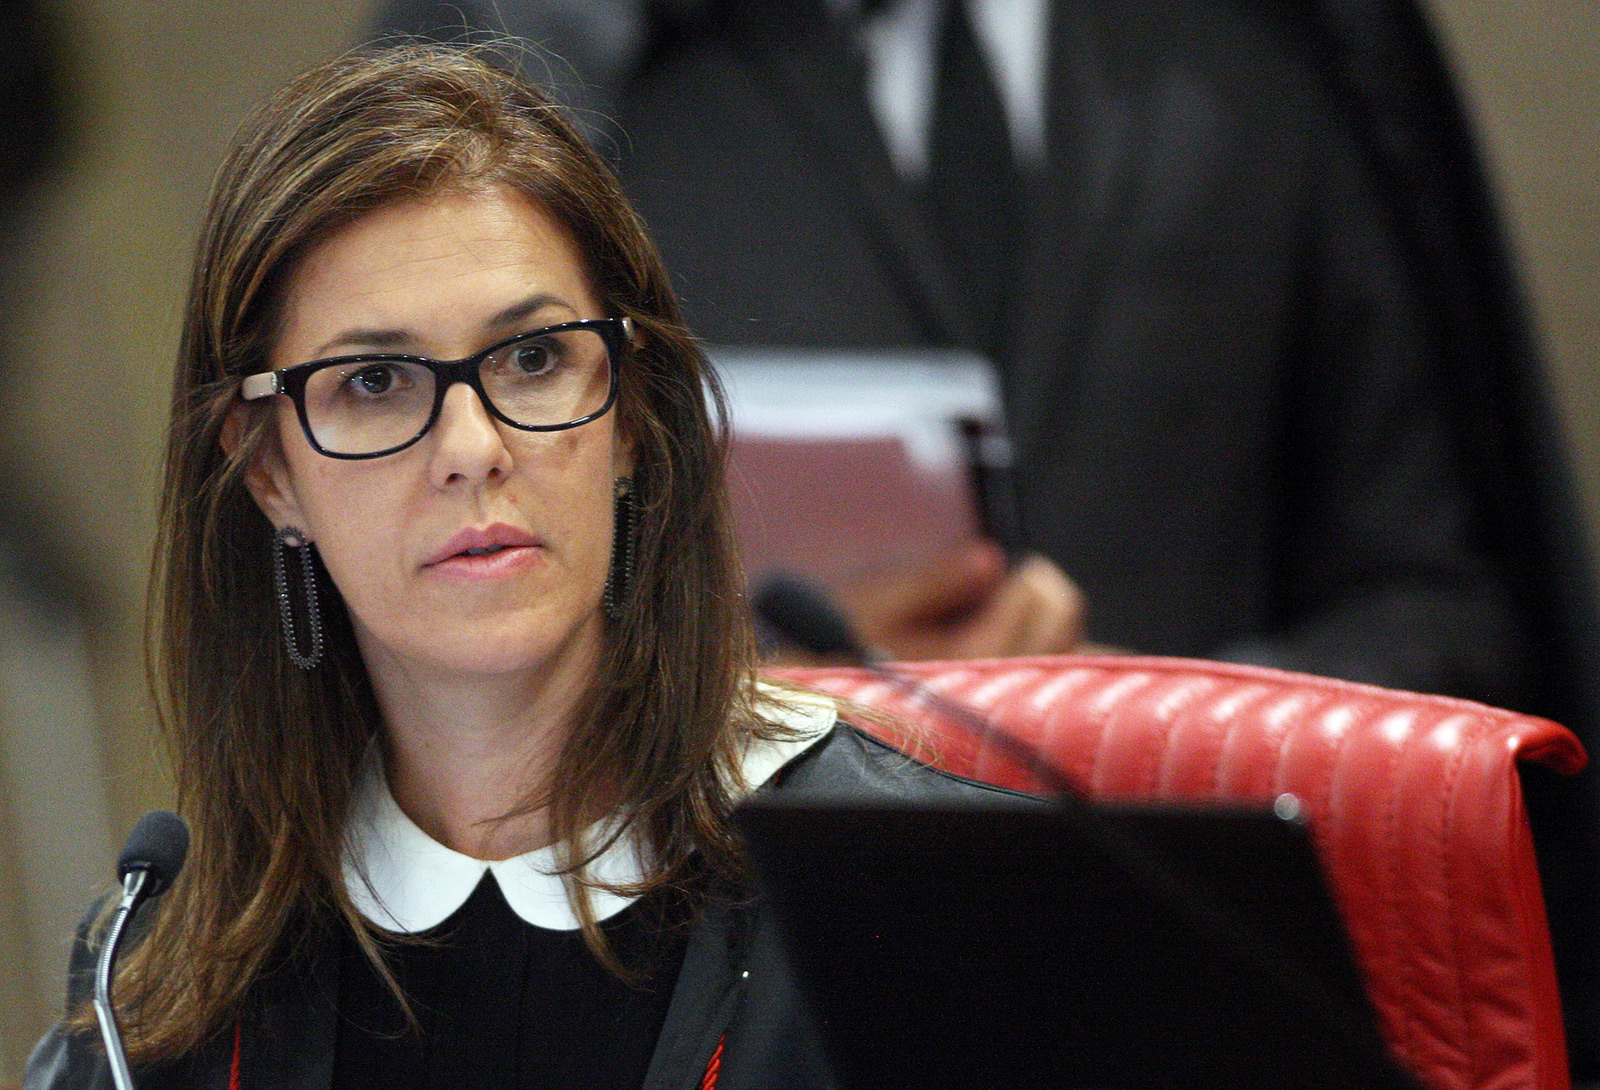 A advogada e ex-ministra do TSE Luciana Lóssio. Foto: Nelson Jr / TSE